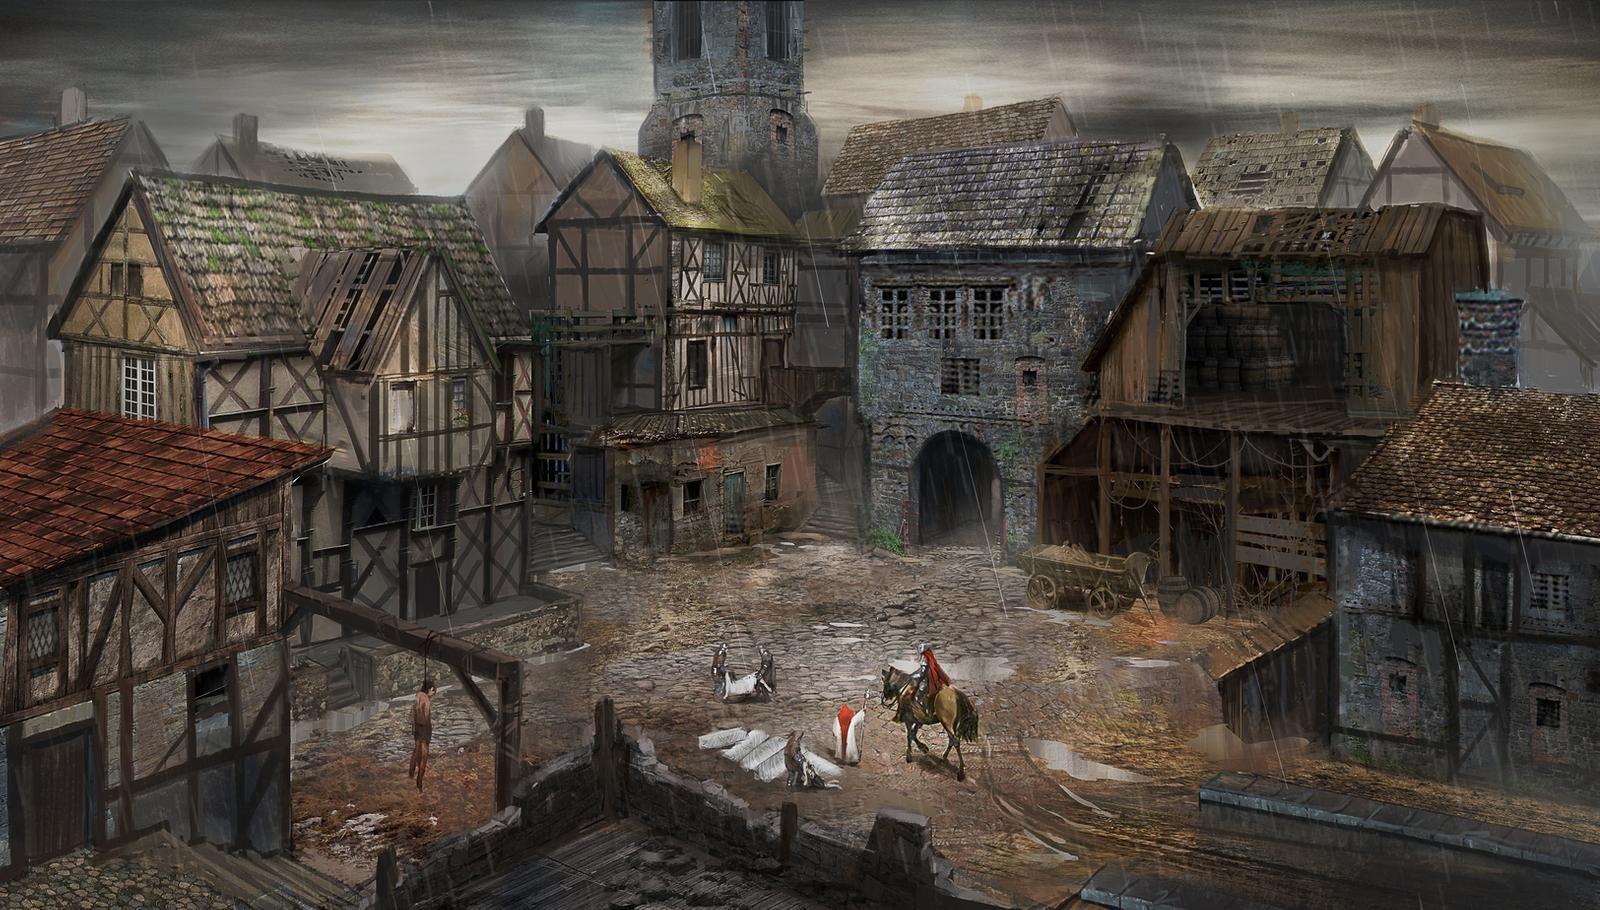 Witch S Curse By Asahisuperdry On Deviantart In 2020 Fantasy Village Fantasy Art Landscapes Fantasy Town